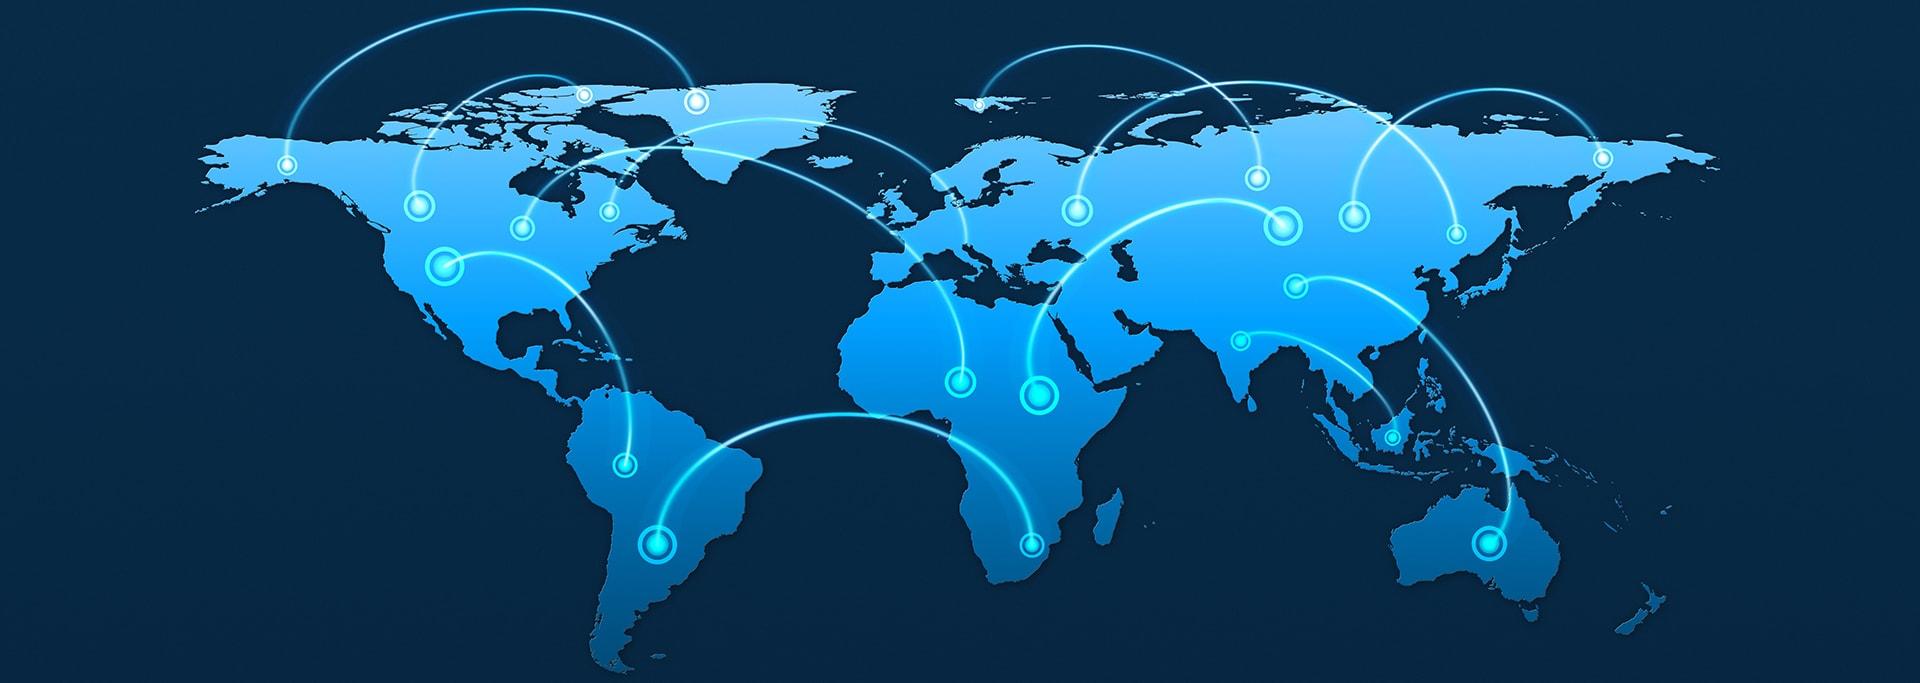 Dedicated Internet Access, Carrier Ethernet Services, MPLS, SD-WAN, VPN, International VPLS